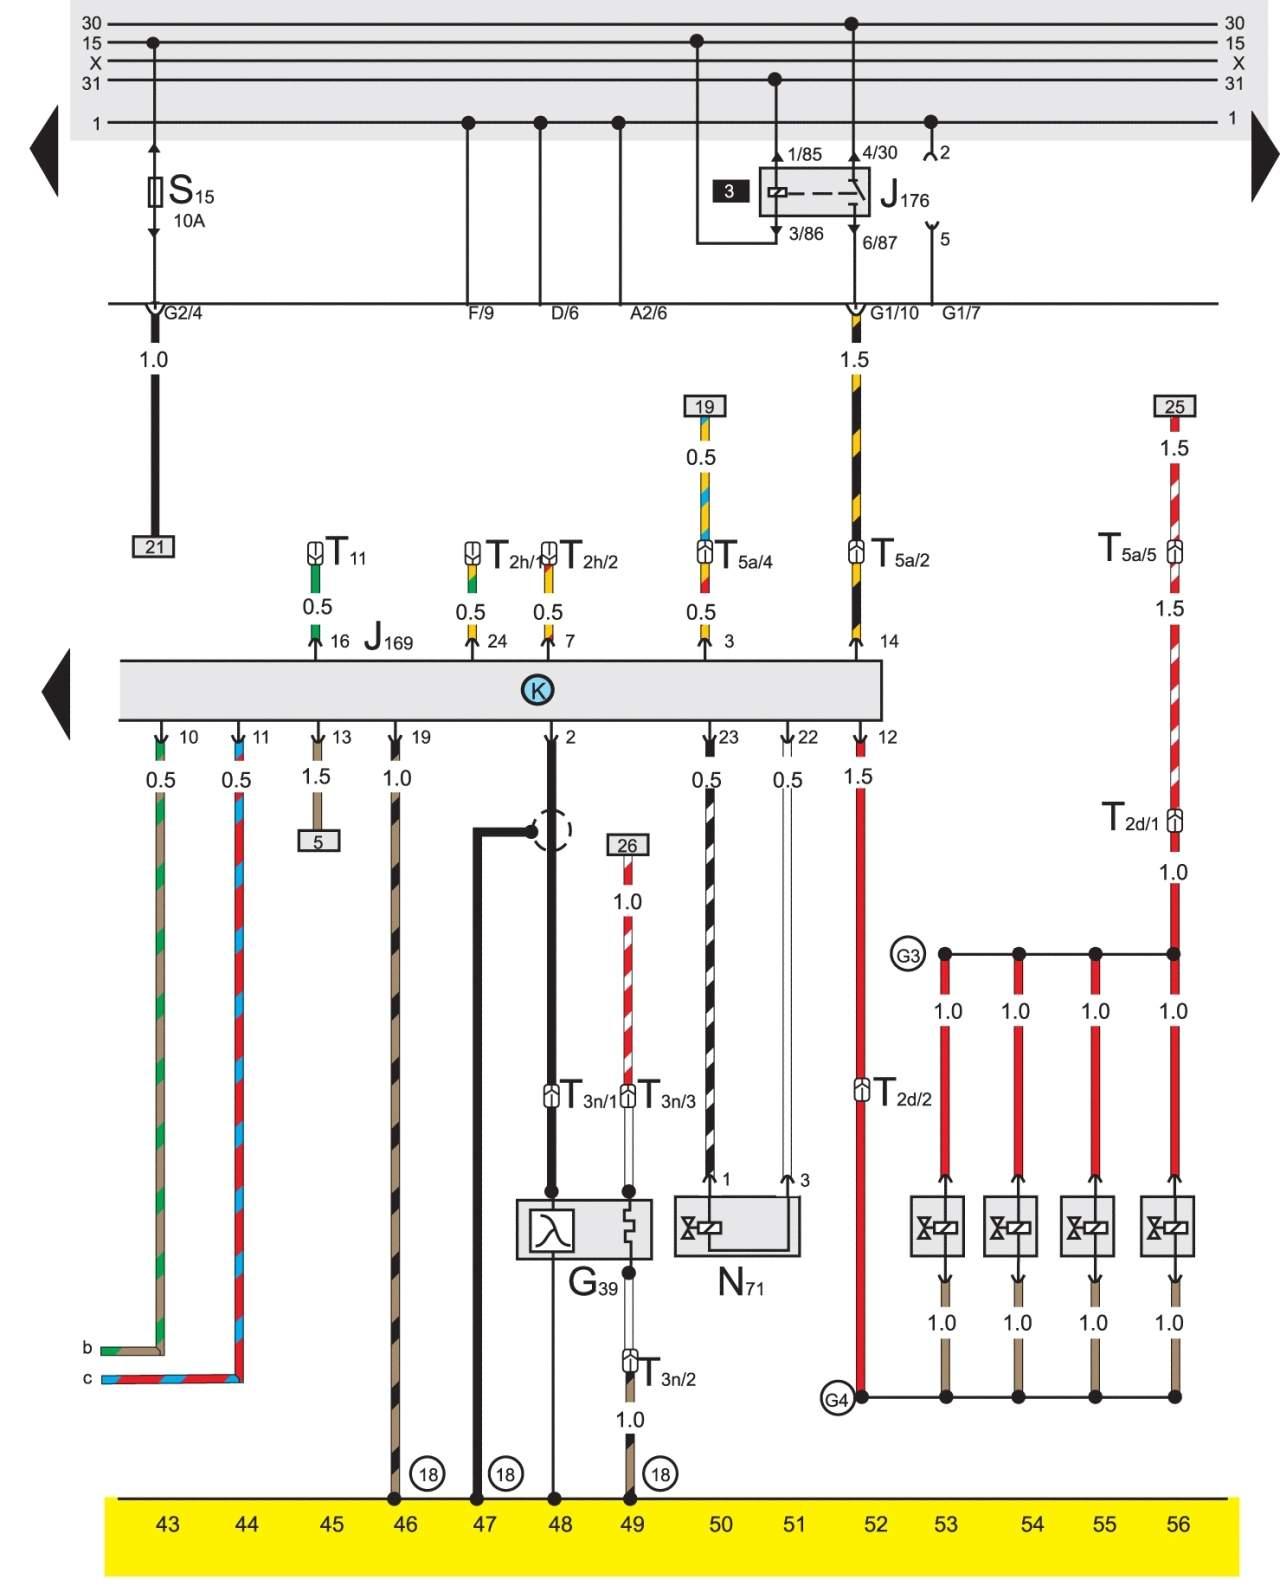 Схема иммобилайзера passat b4